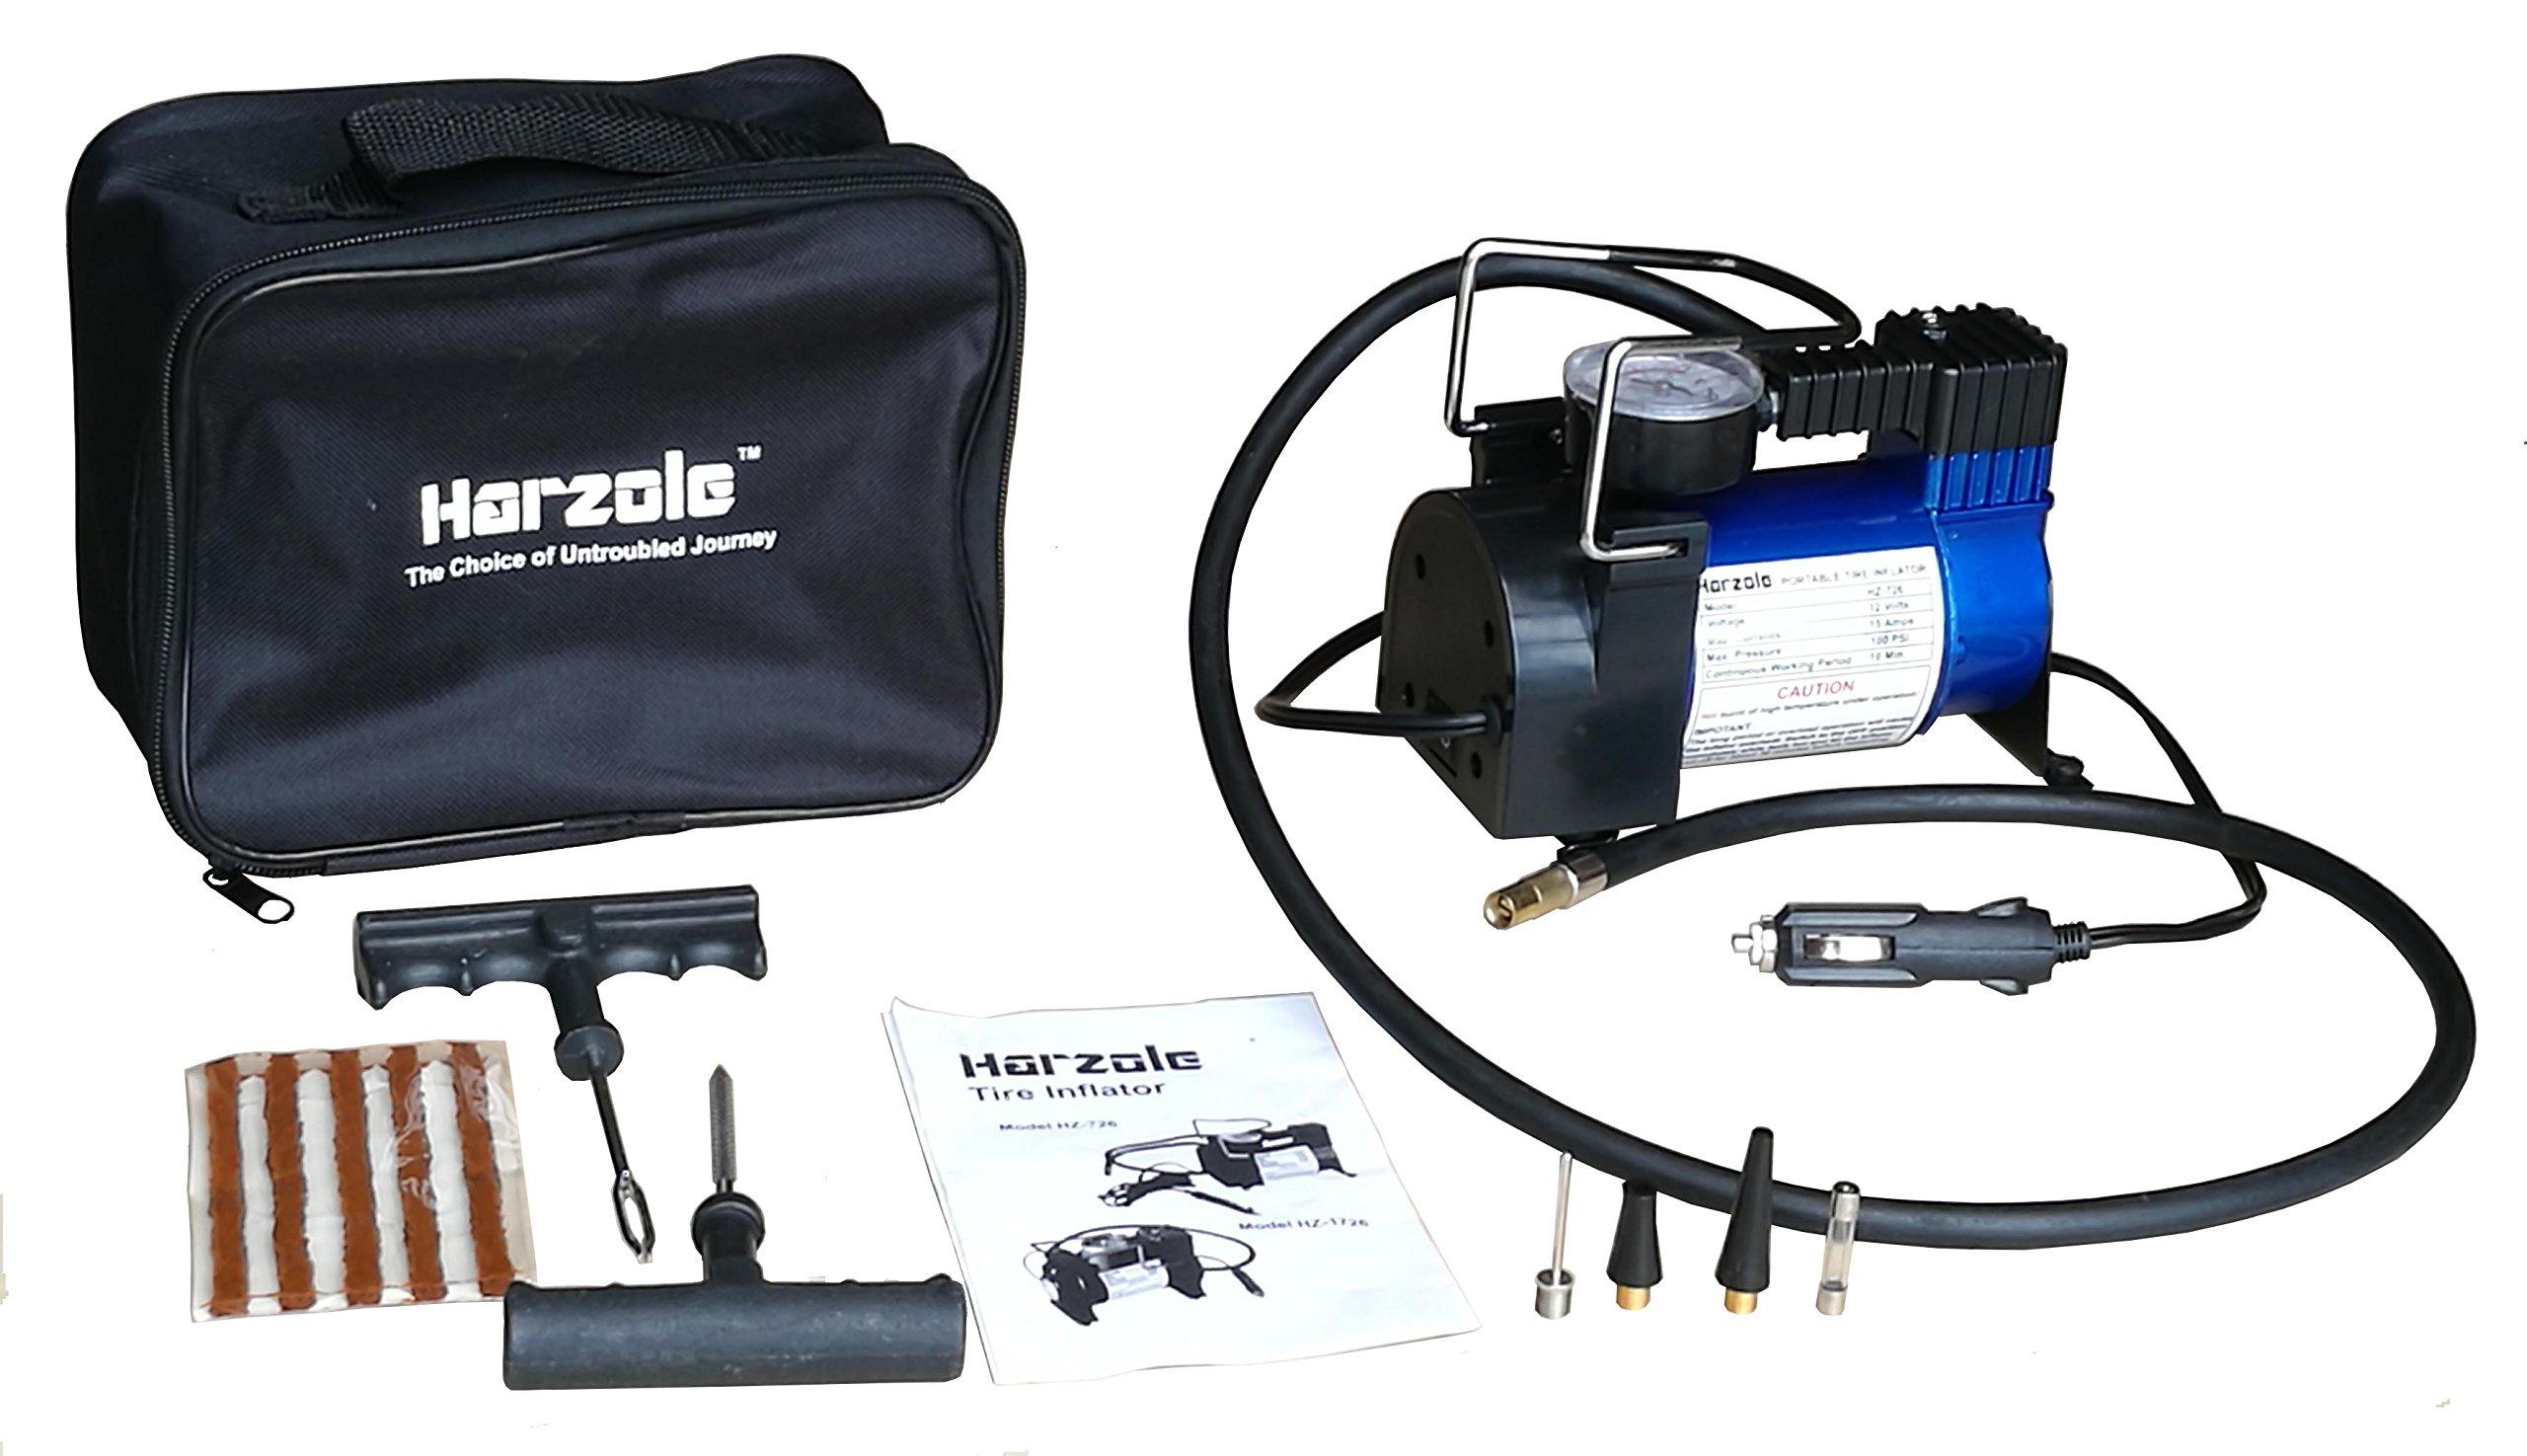 Harzole HZ-726B DC 12V Car Air Pump, Tire Inflator, Portable Air Compressor Kit HZ-726 with tire Repair kit HZ-420B